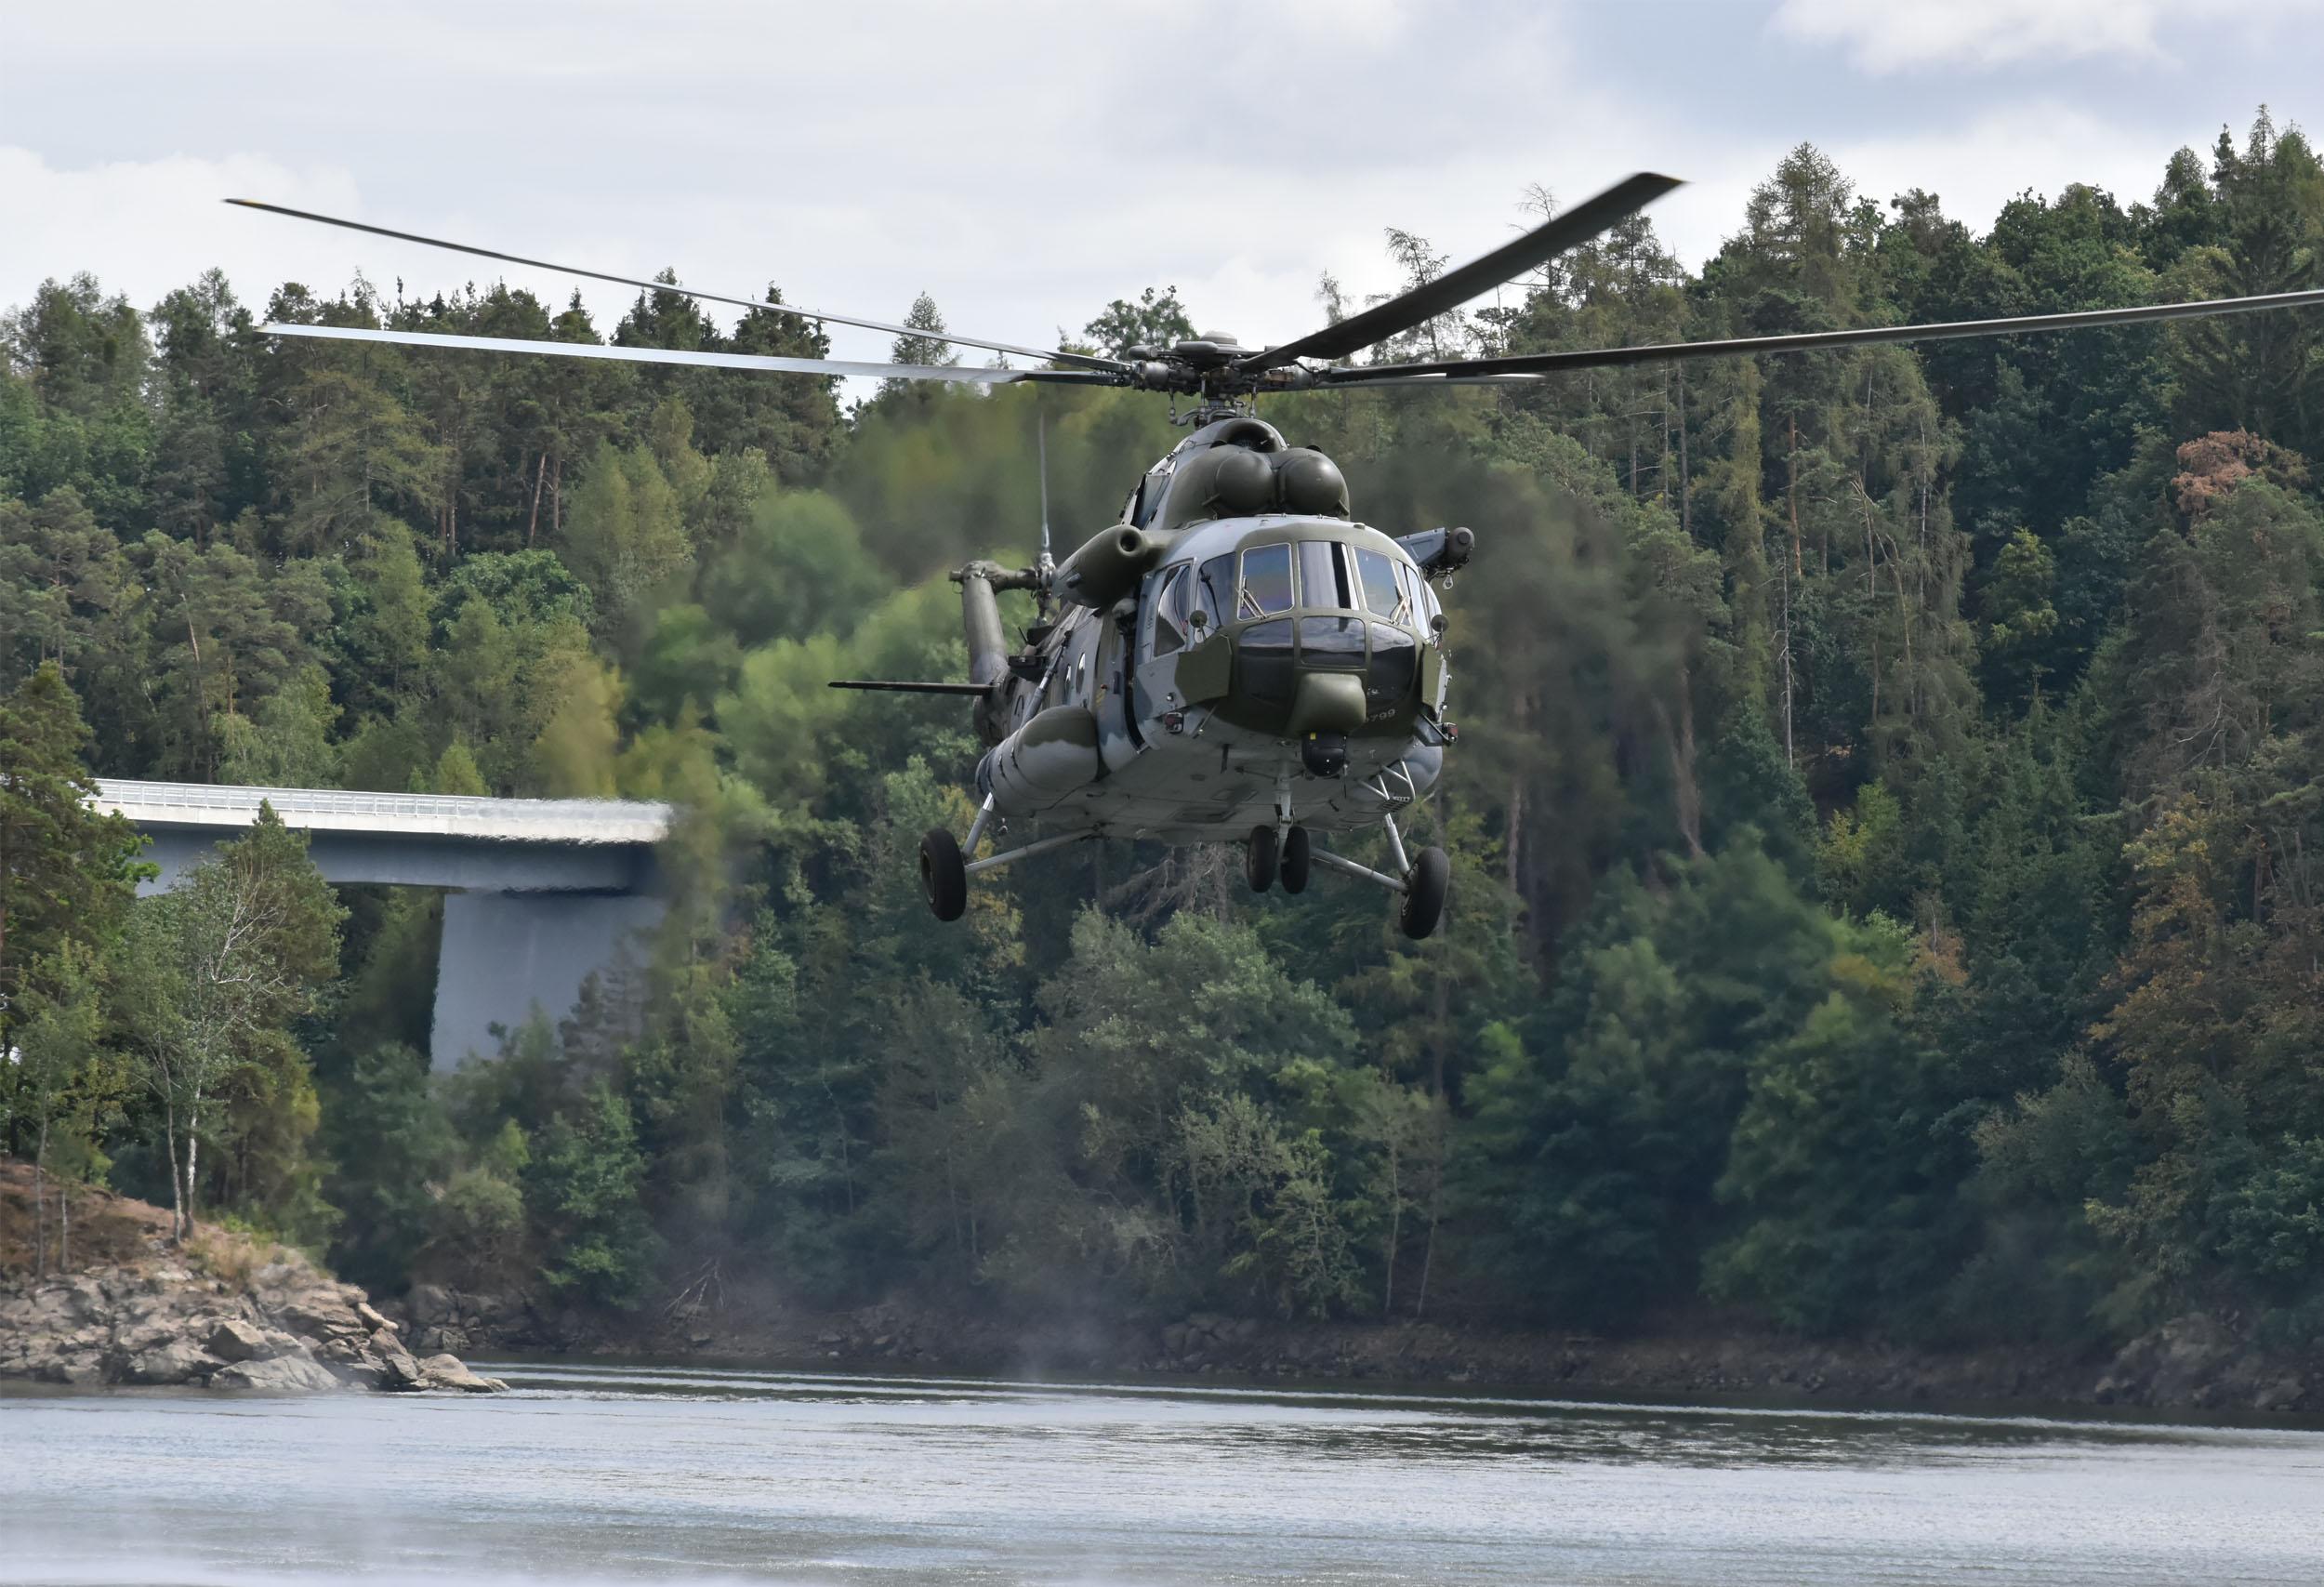 Seznamka - Hory Bory